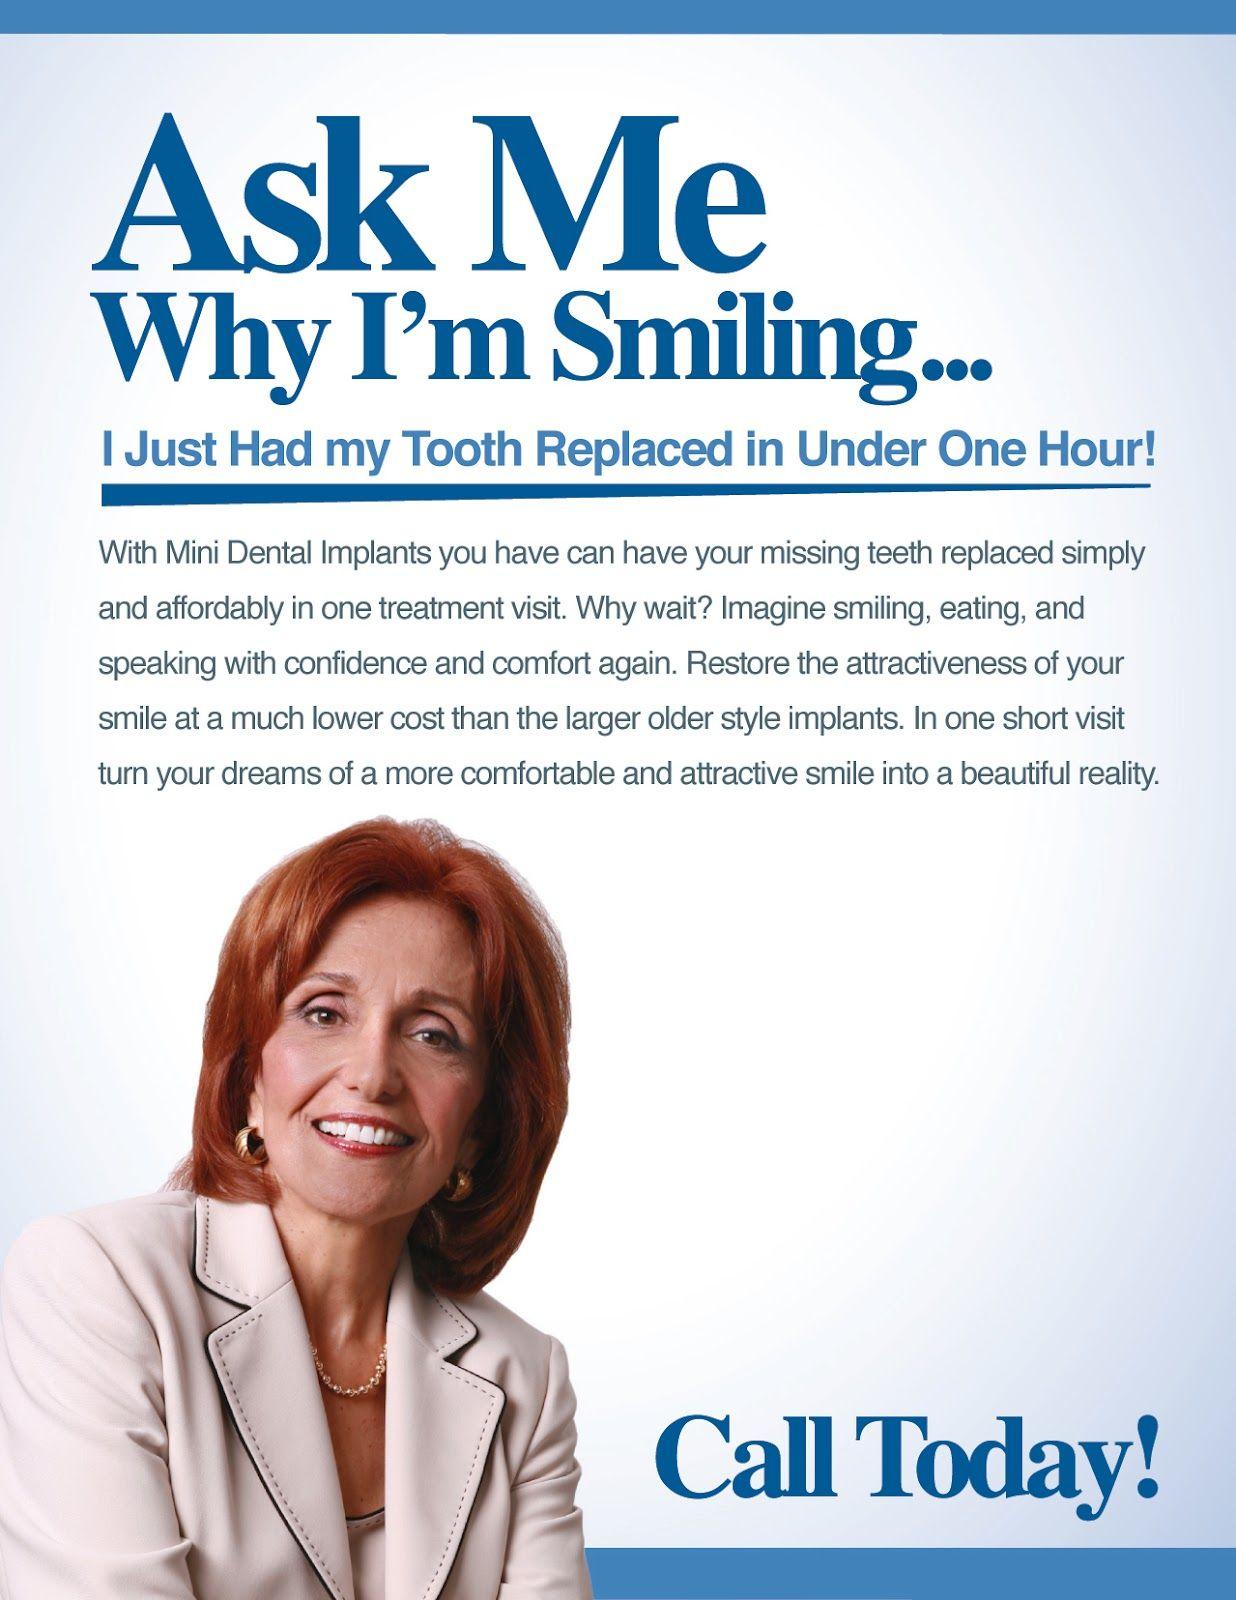 Mini Dental Implants ~ Family Dental Care